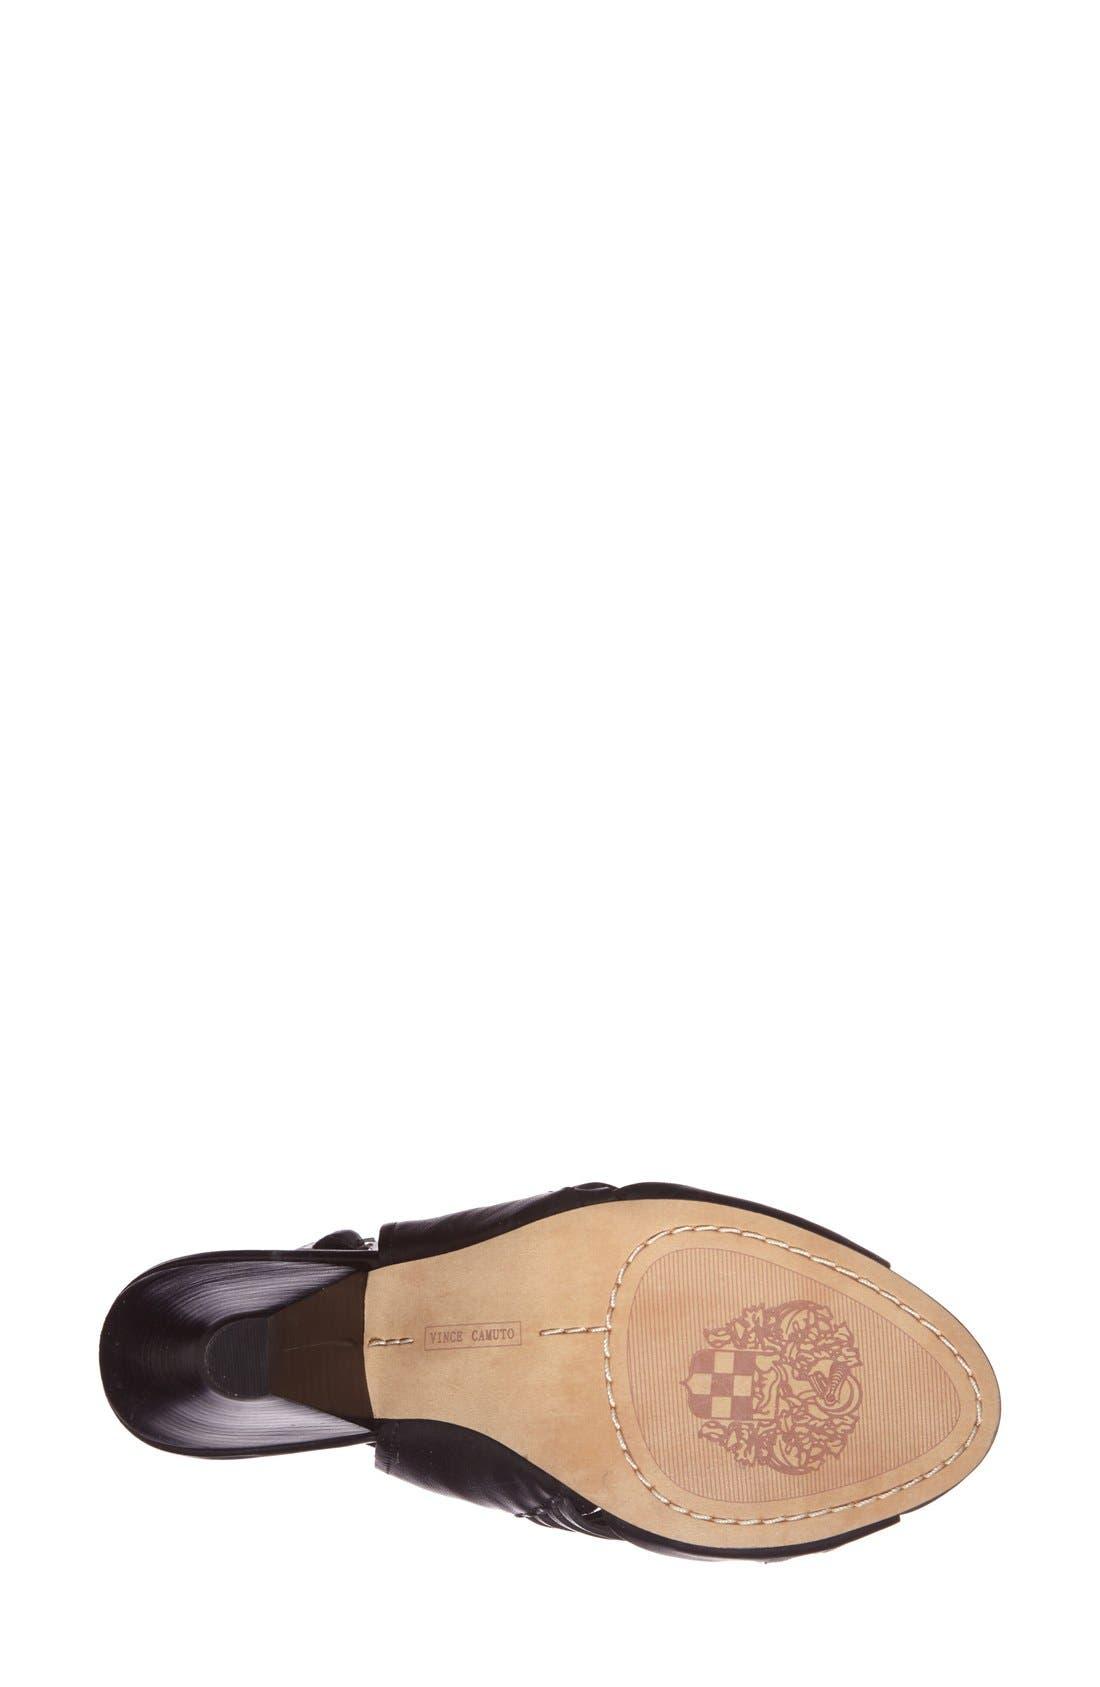 'Effel' Sandal,                             Alternate thumbnail 4, color,                             Black